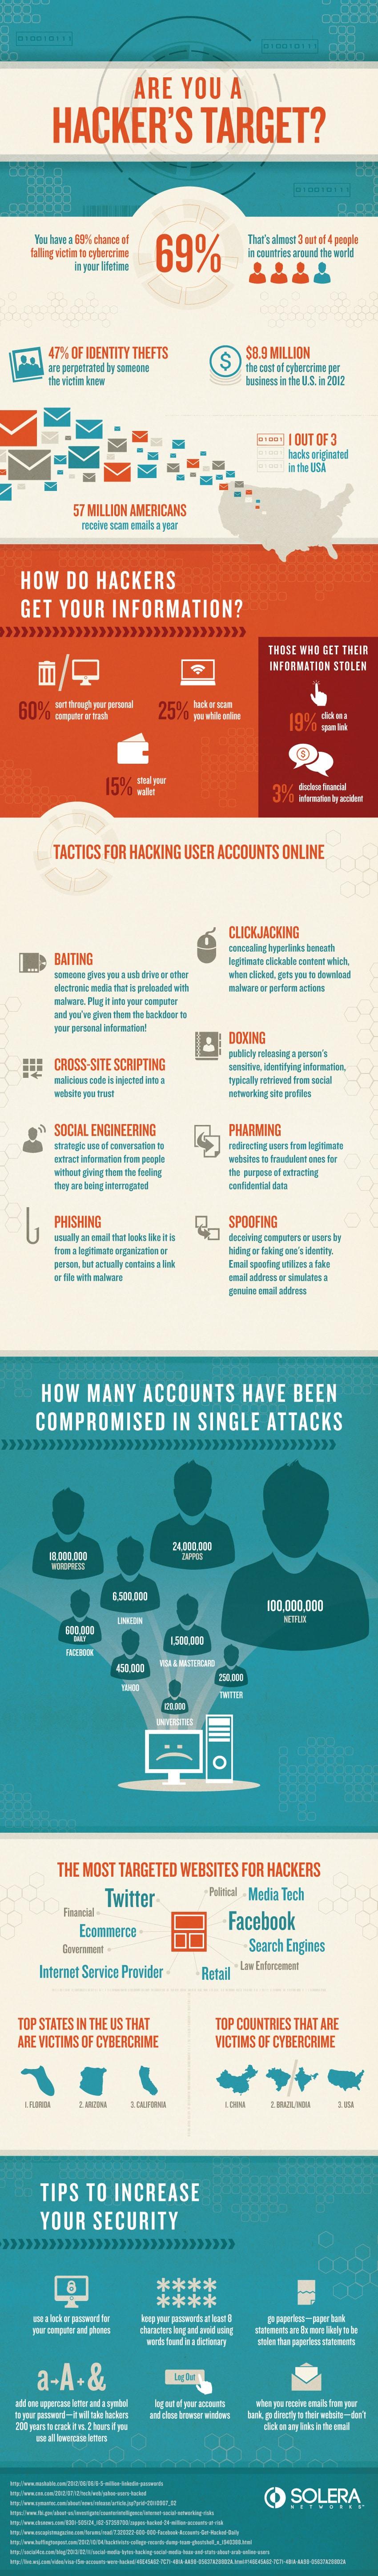 hacker-target-victim-statistics-infogrphic